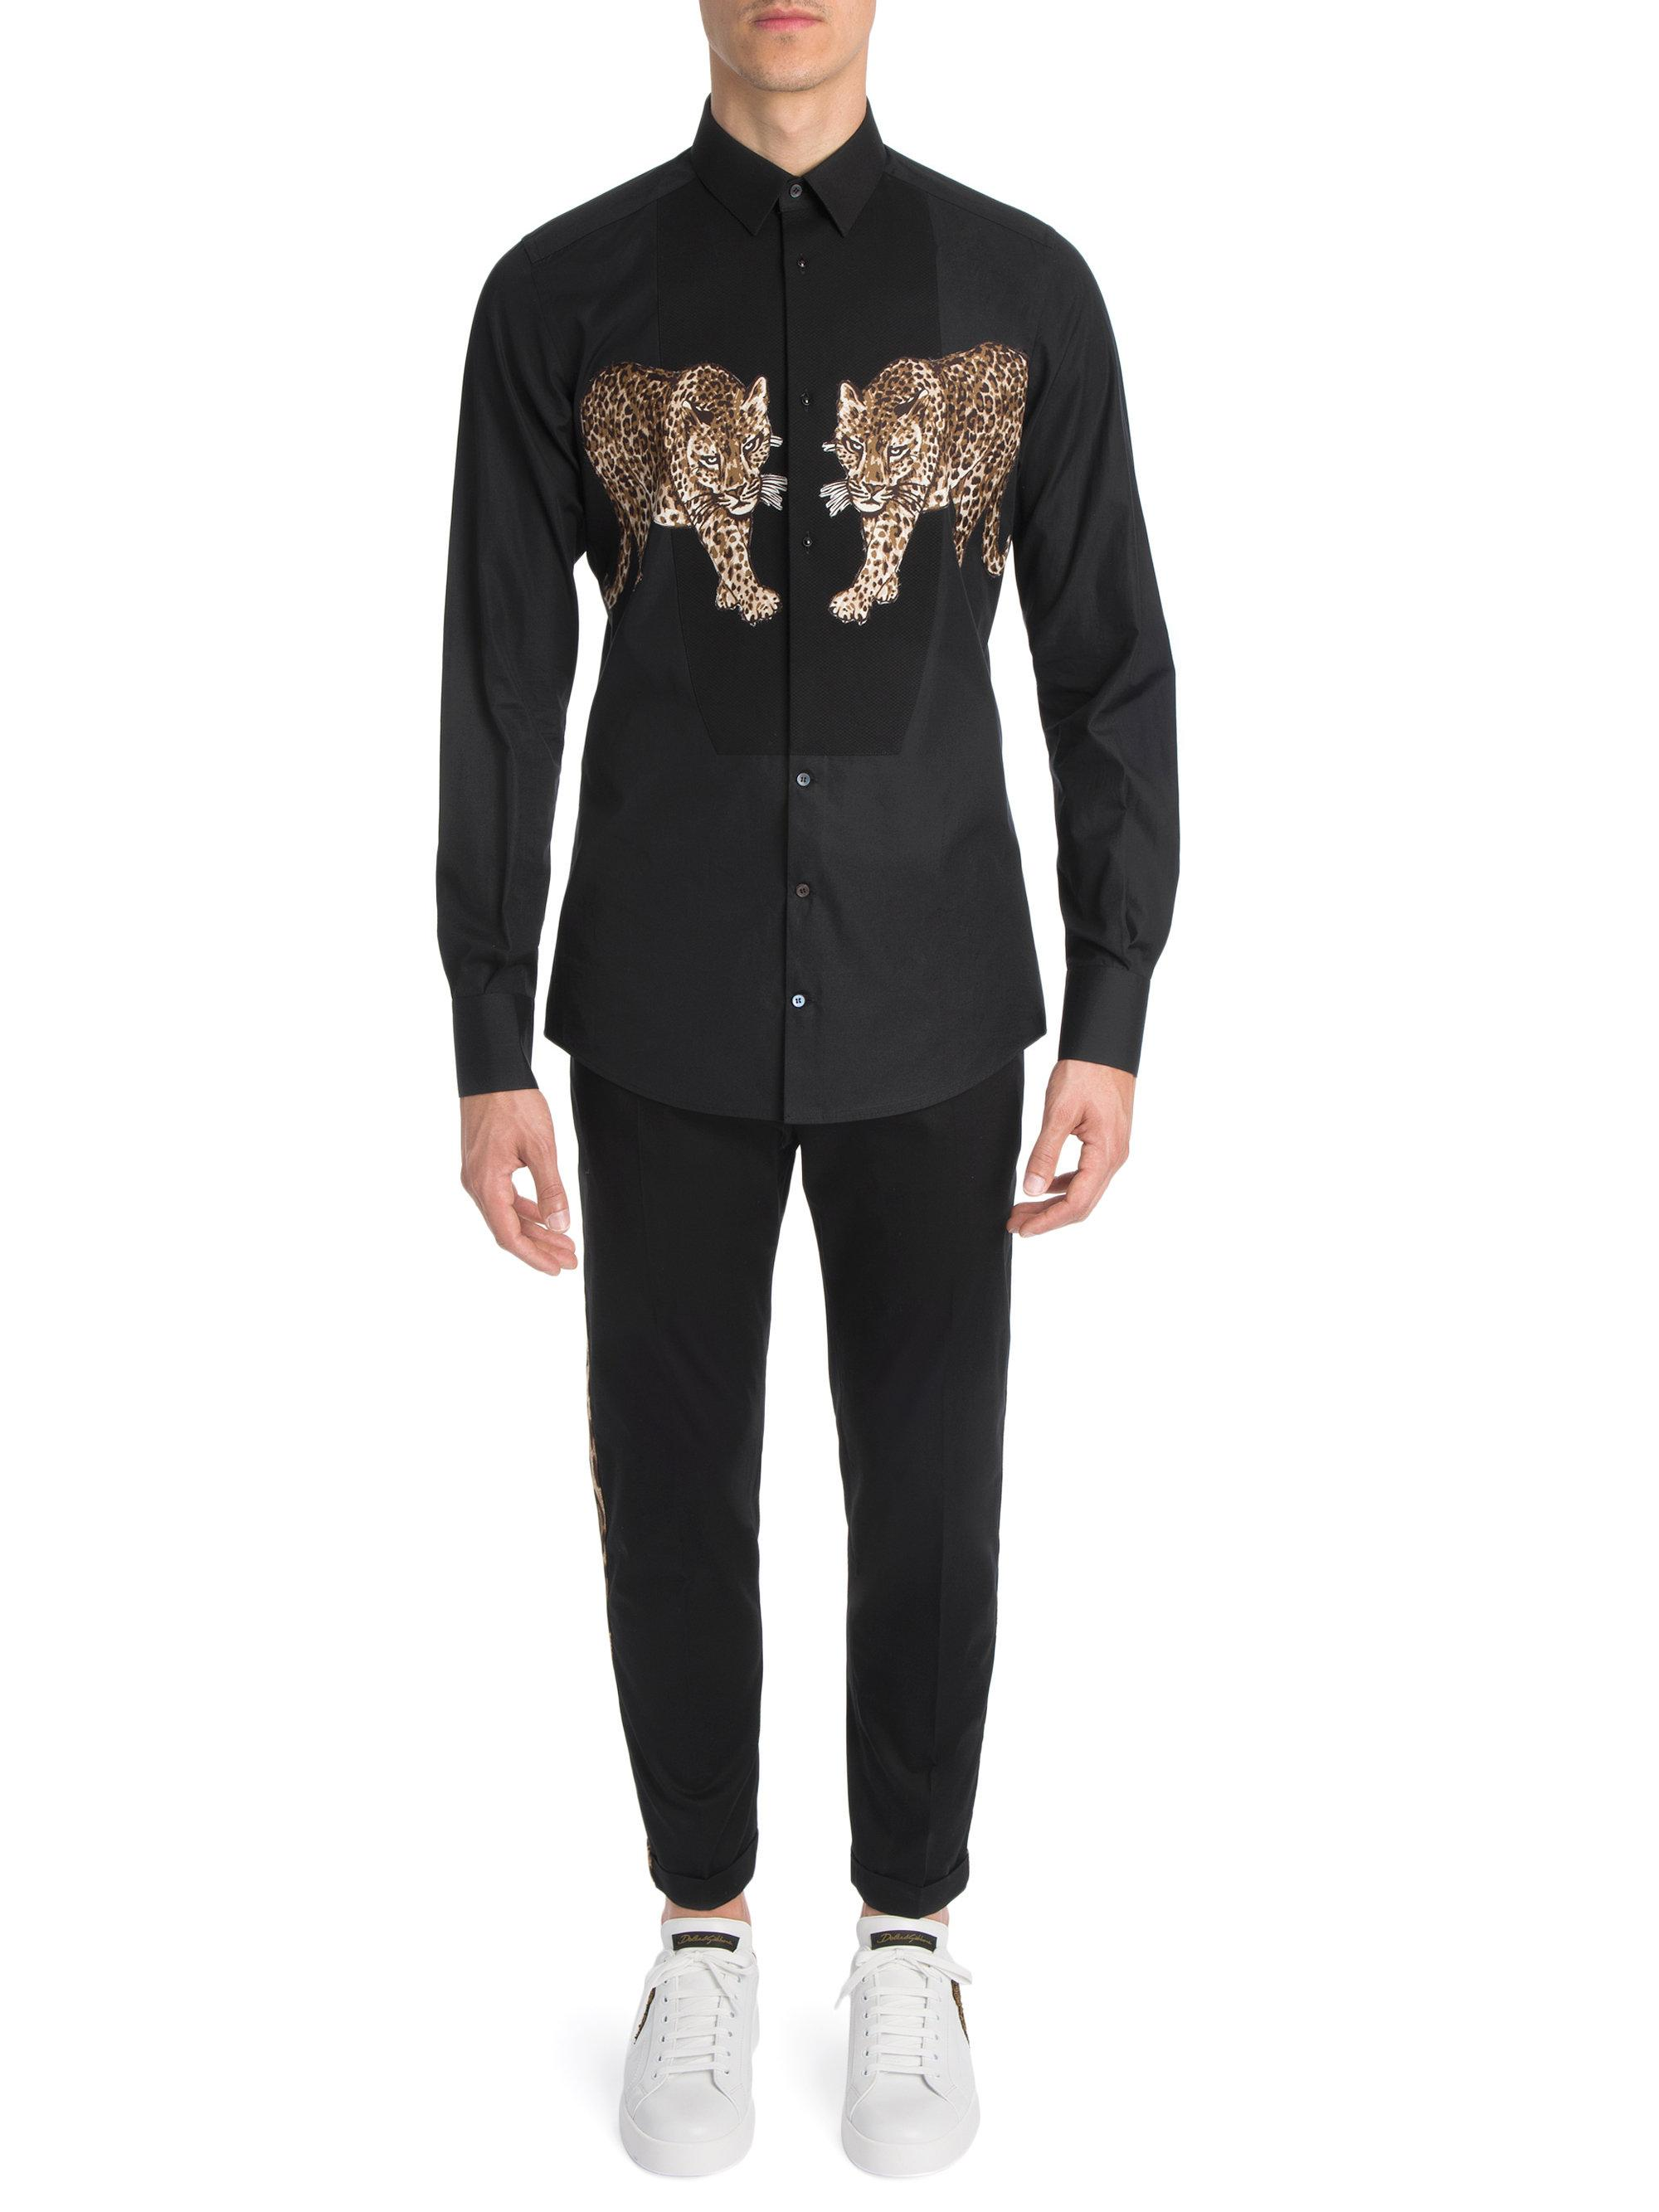 20f9d6b8ac55 Dolce & Gabbana Leopard Button-down Shirt in Black for Men - Lyst